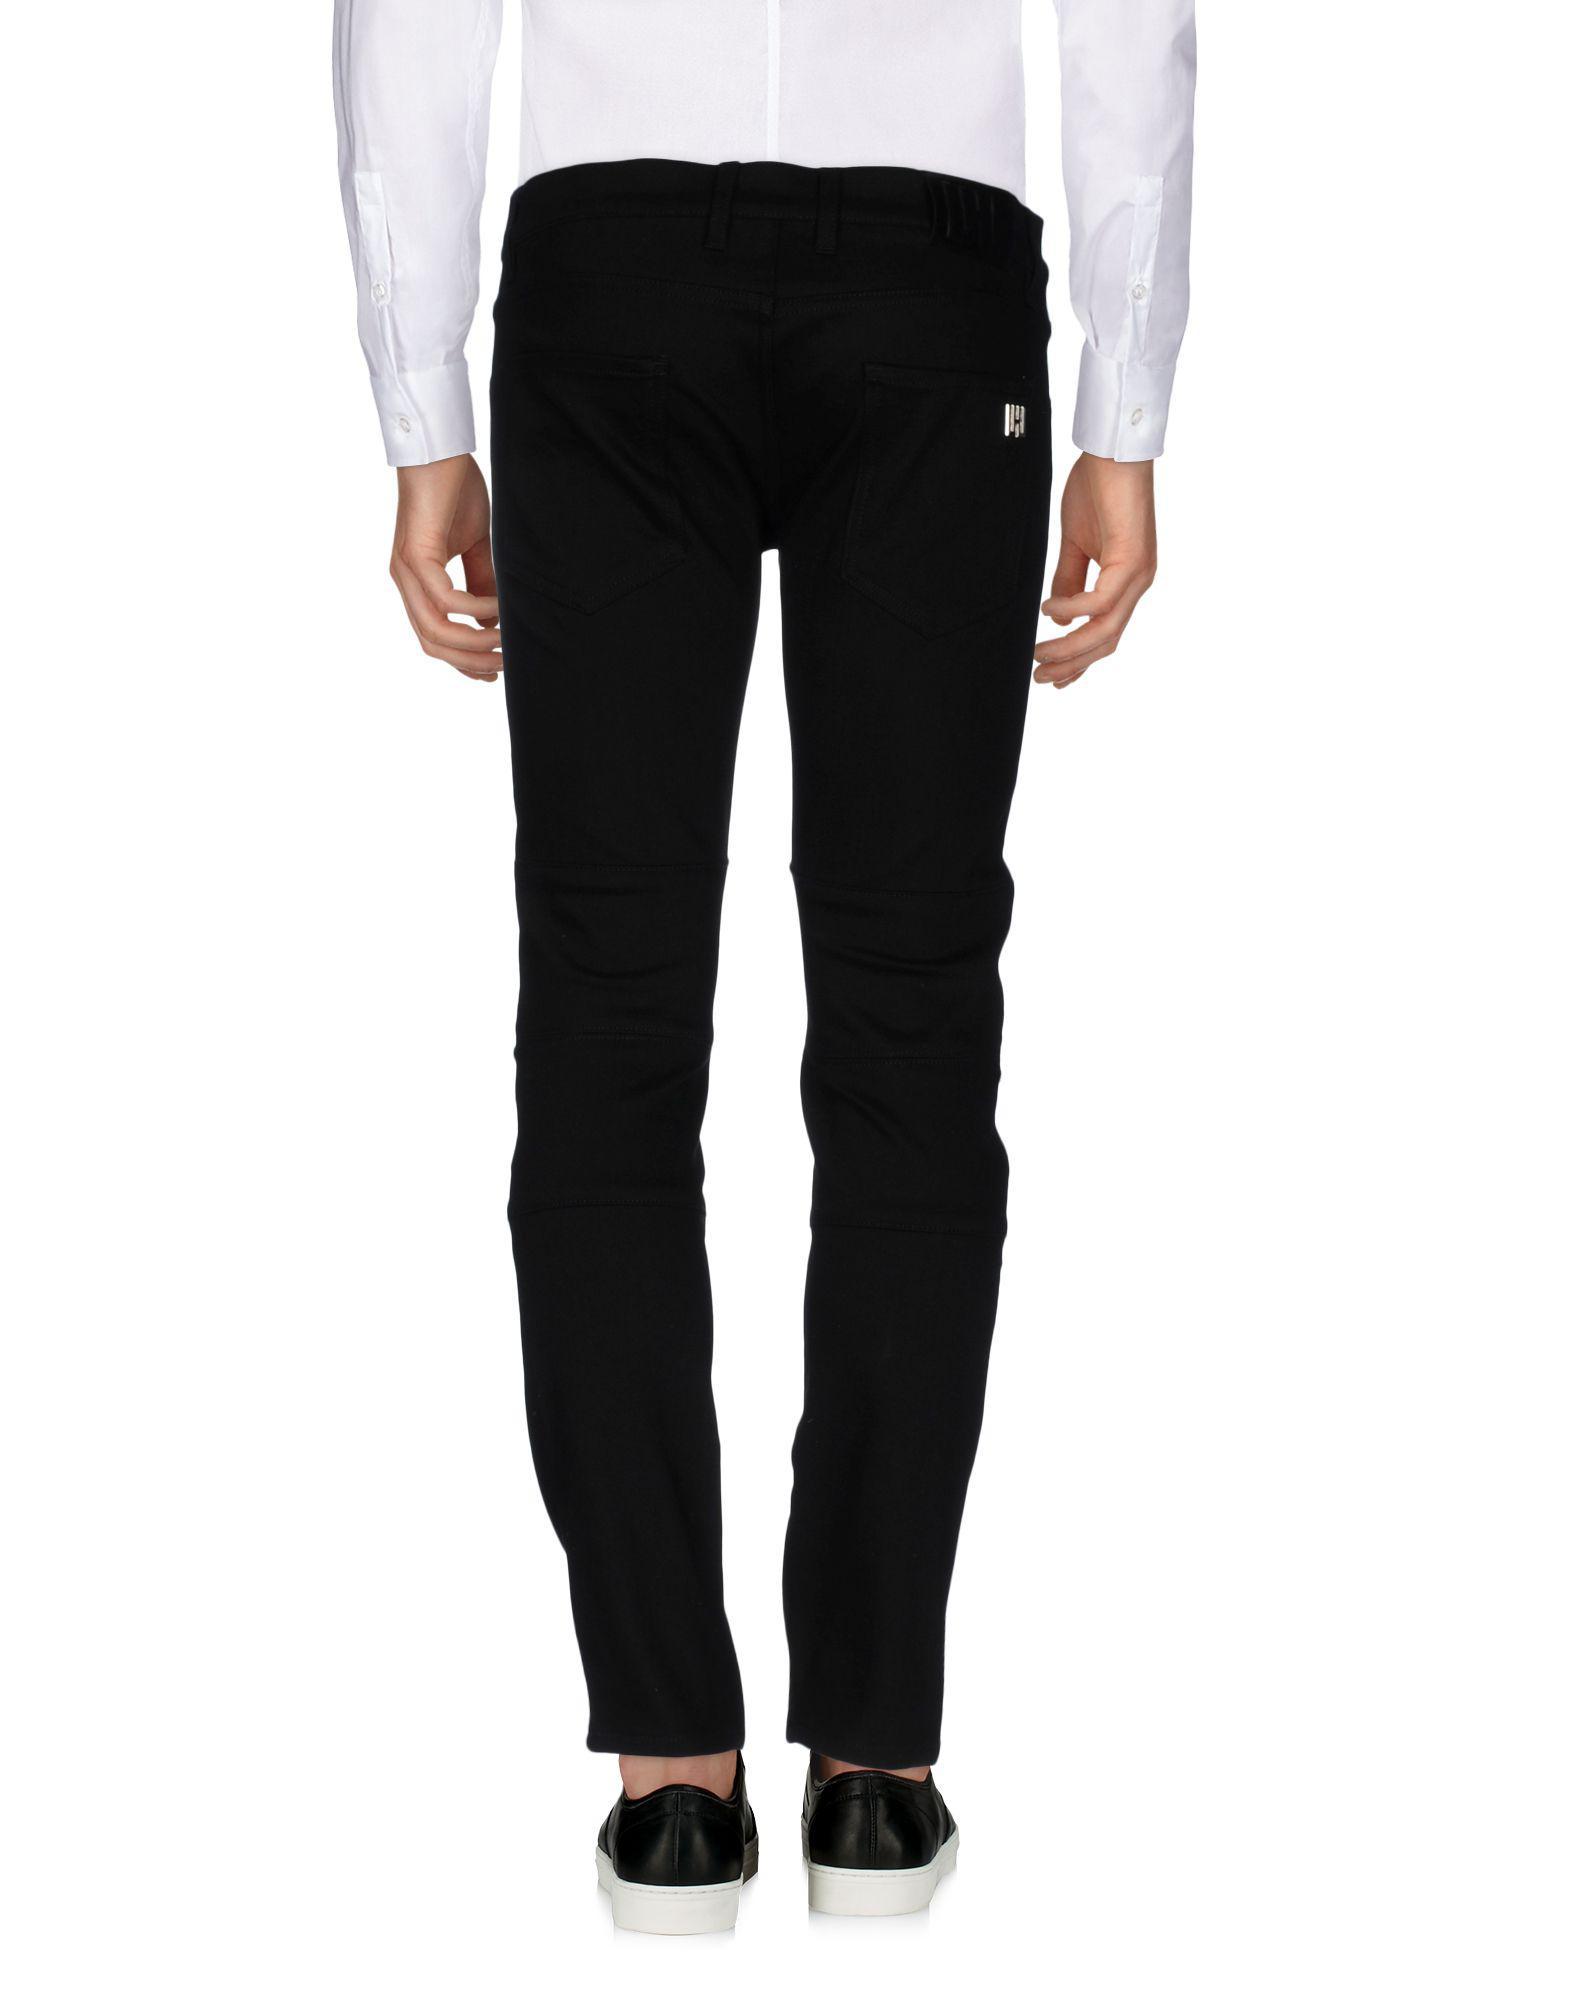 Les Hommes Cotton Casual Trouser in Black for Men